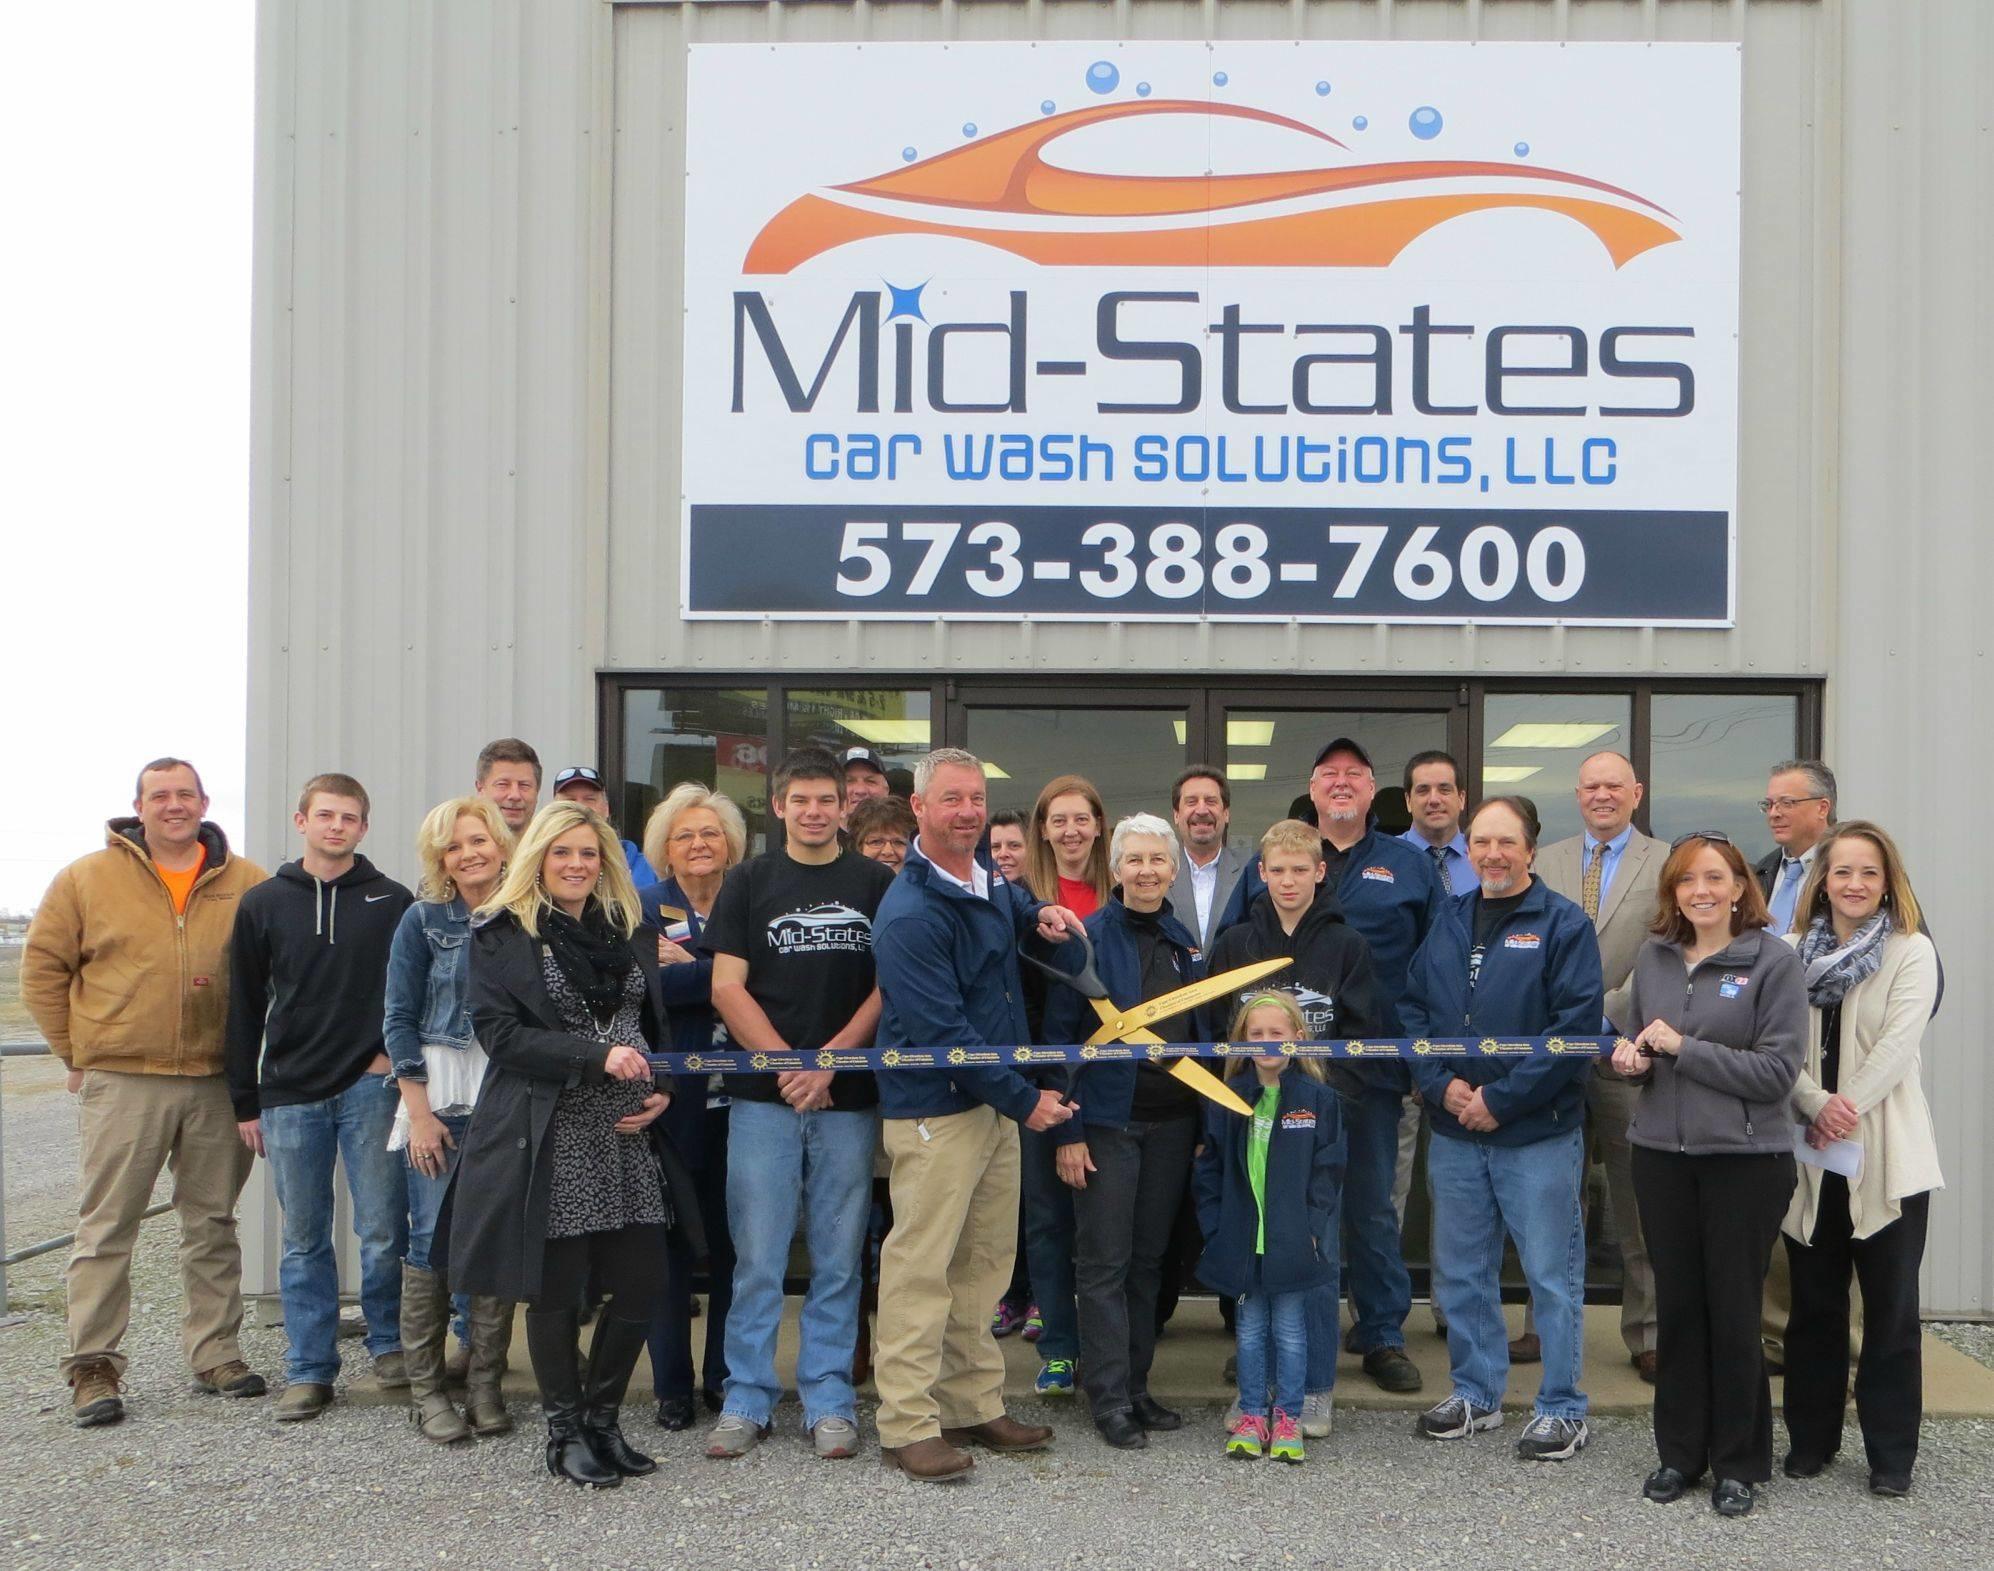 Mid-States Car Wash Solutions, LLC image 10